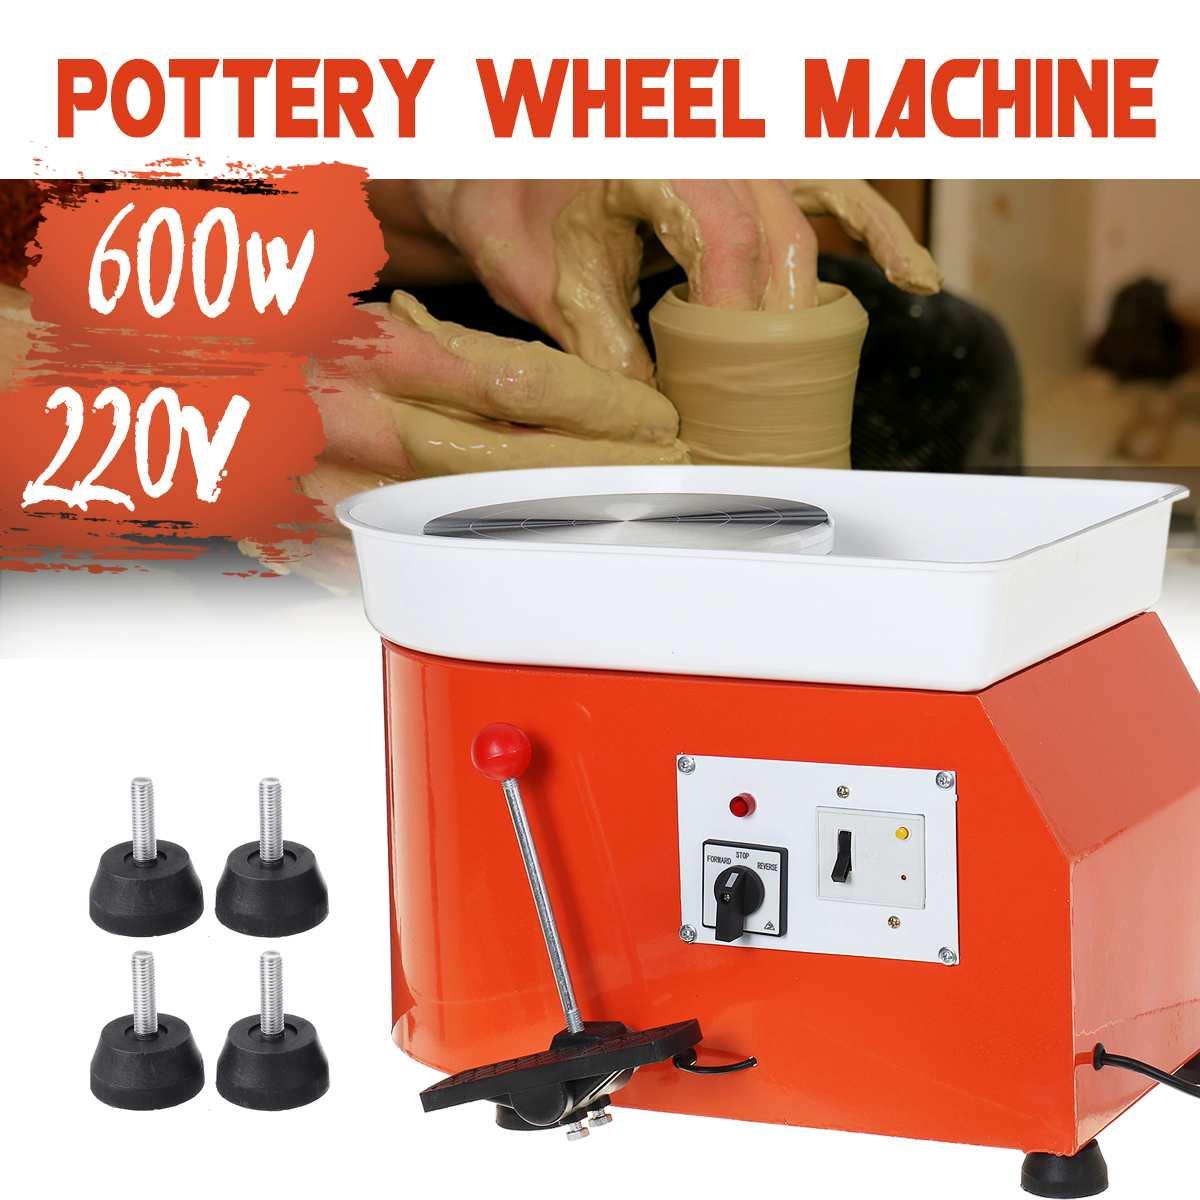 Meigar 220V 600W Turning Electric Pottery Wheel Machine AU DIY Clay Pottery Tool Kit For Ceramic Work 25CM Dia.